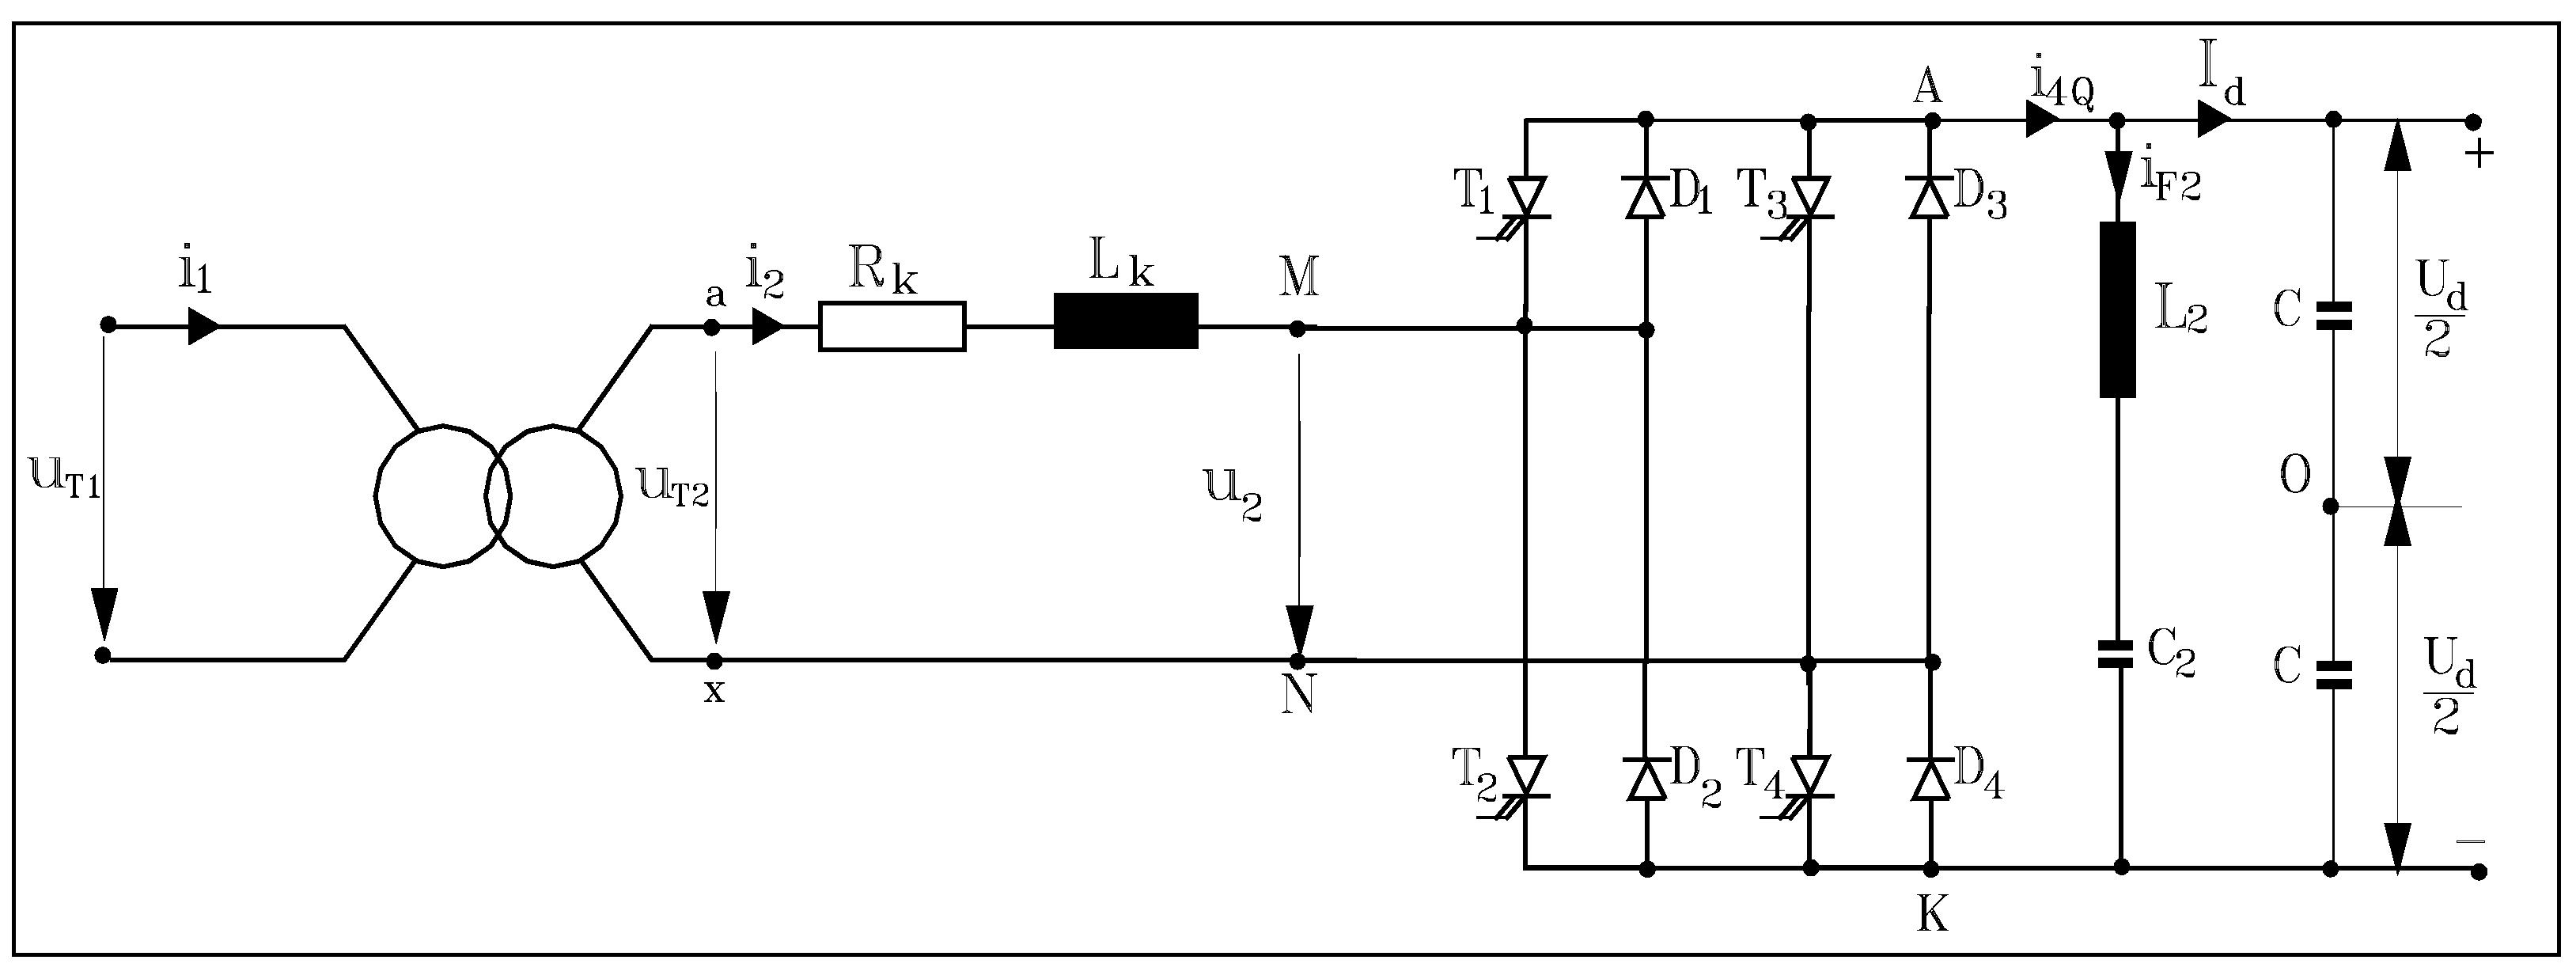 Whelen Light Control Wiring Diagram Schematics Data Diagrams Siren Box Speaker Liberty Odicis Strobe Lights